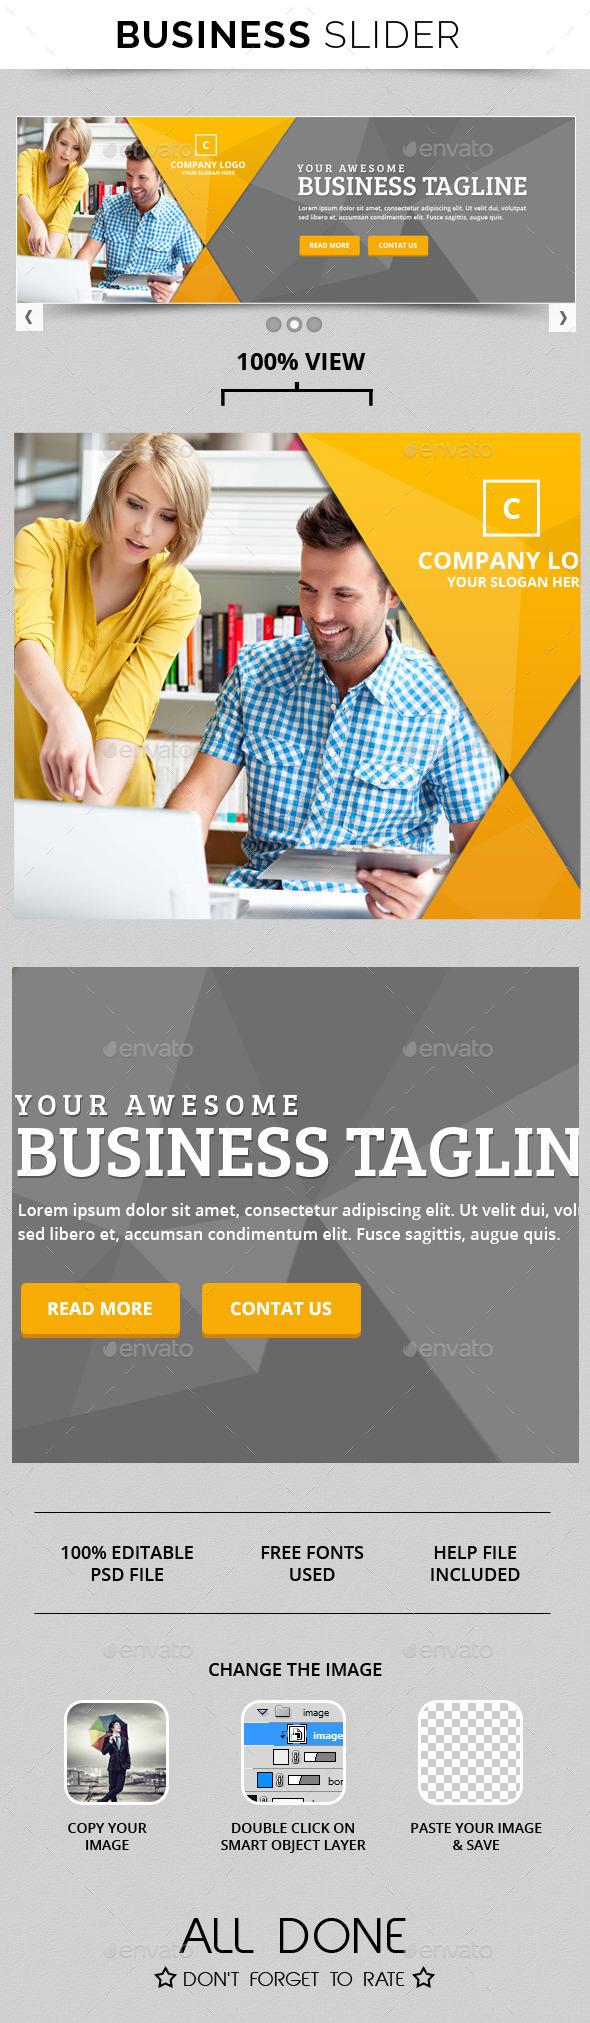 GraphicRiver Business Slide V7 10774440